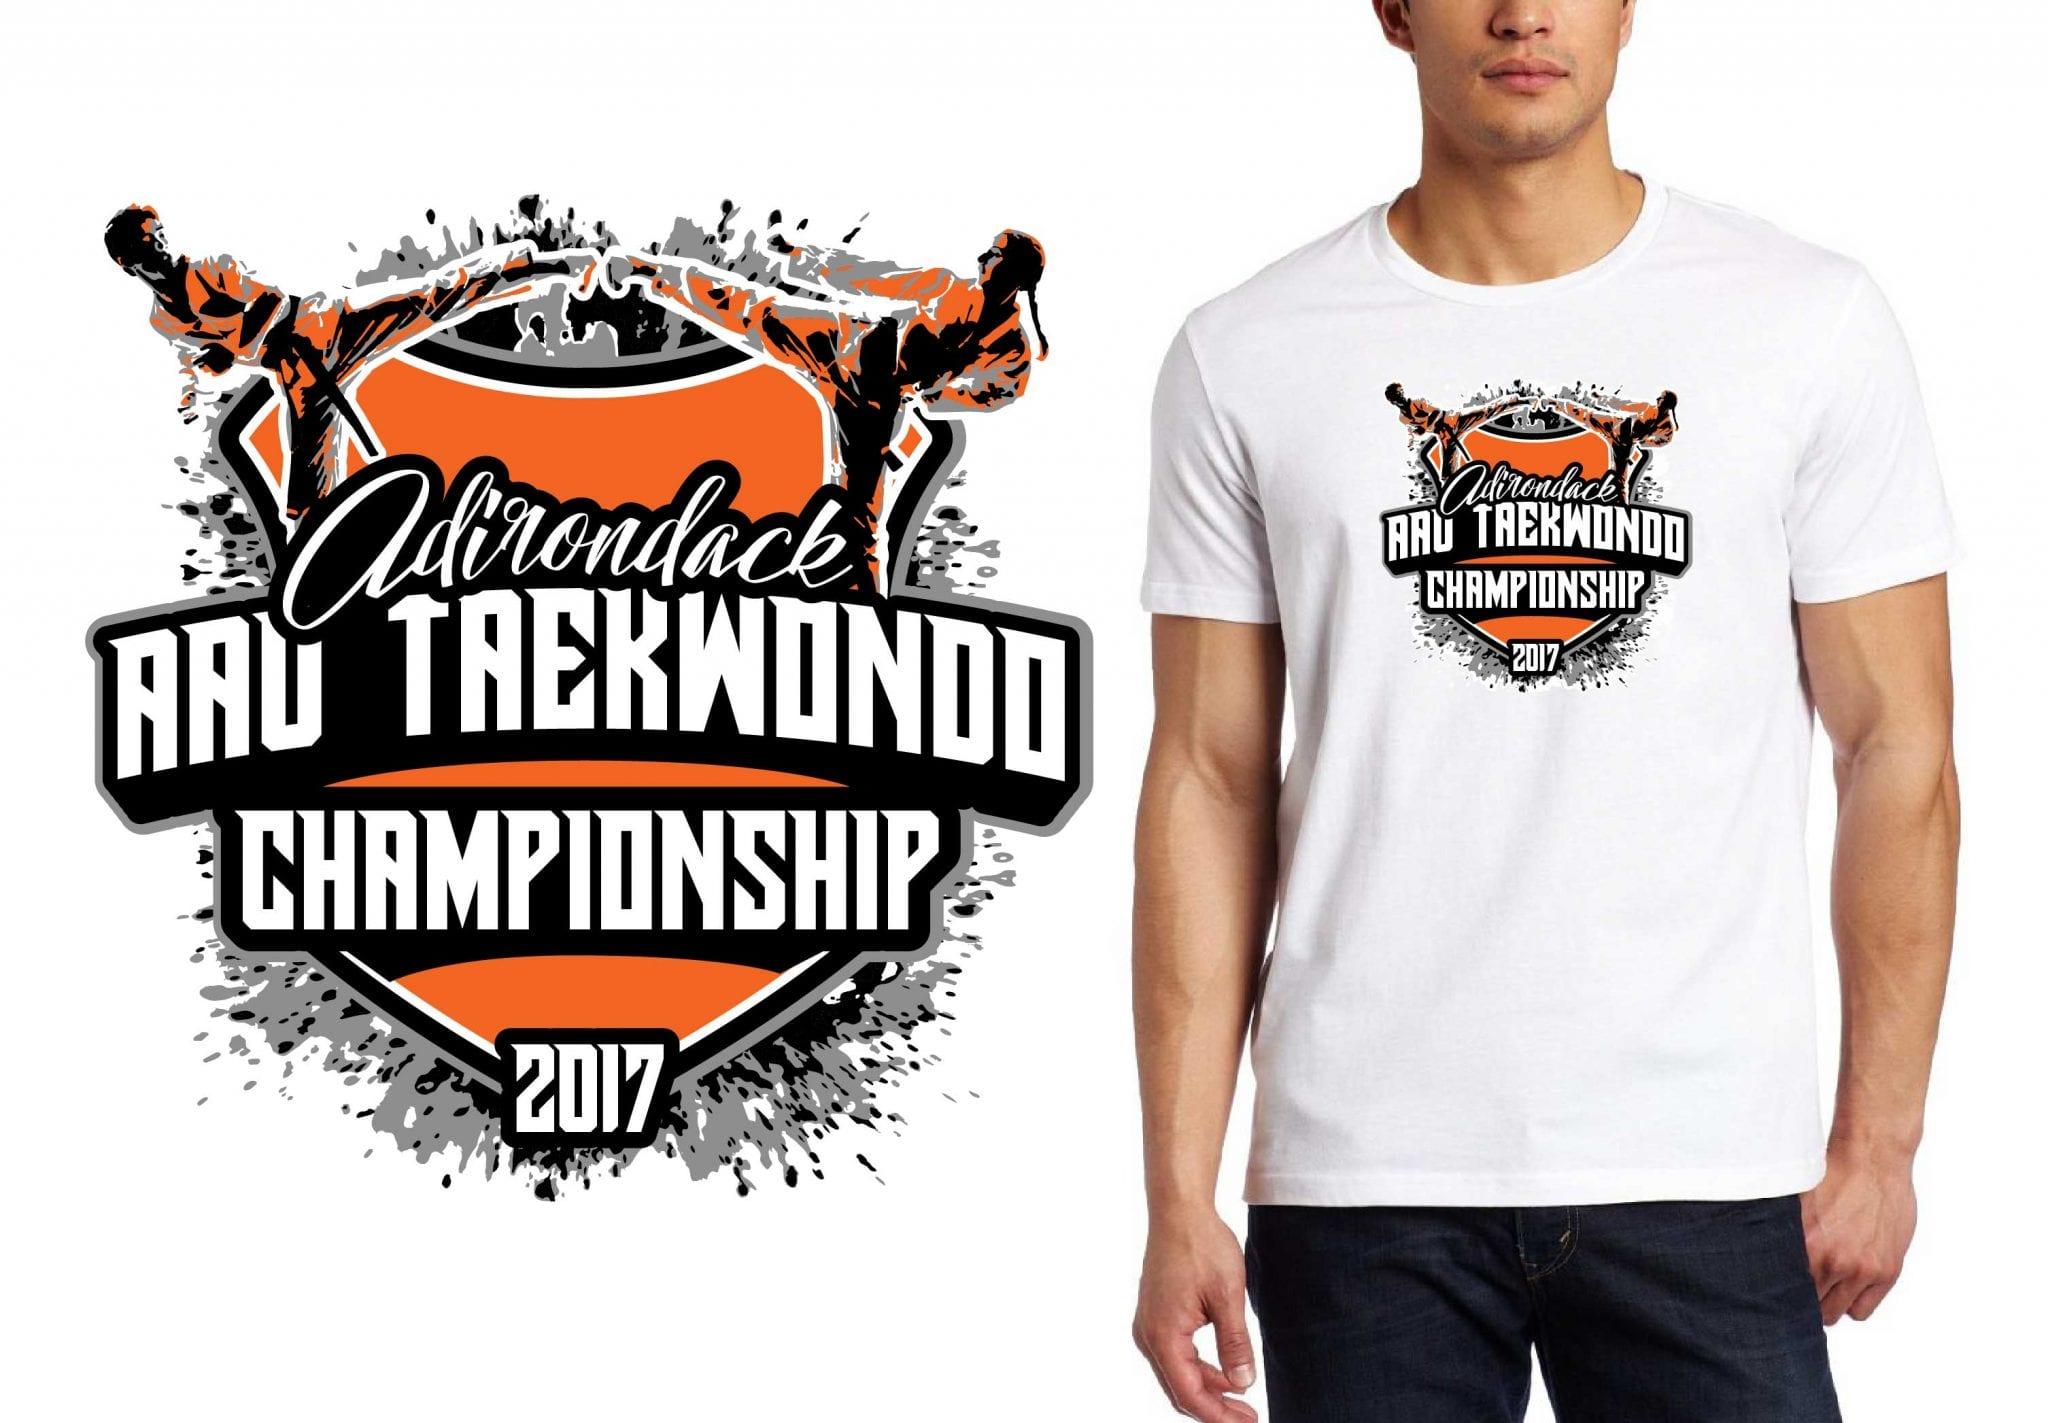 TAEKWONDO LOGO for Adirondack-AAU-Taekwondo-Championship T-SHIRT UrArtStudio